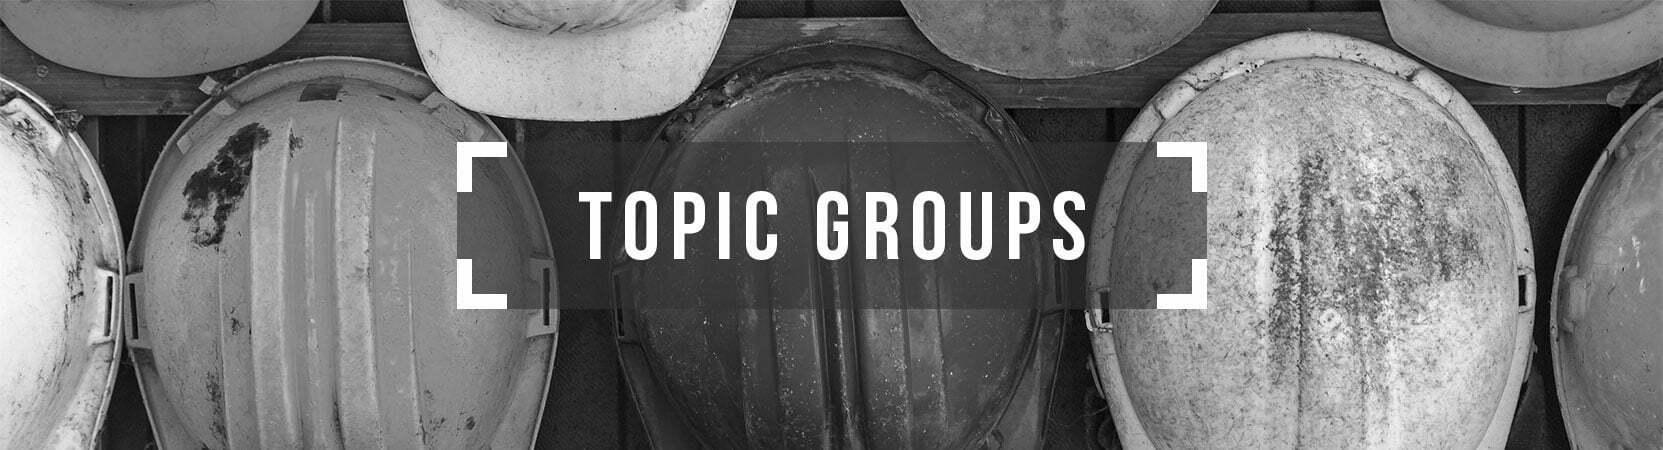 Efl topic groups banner 2